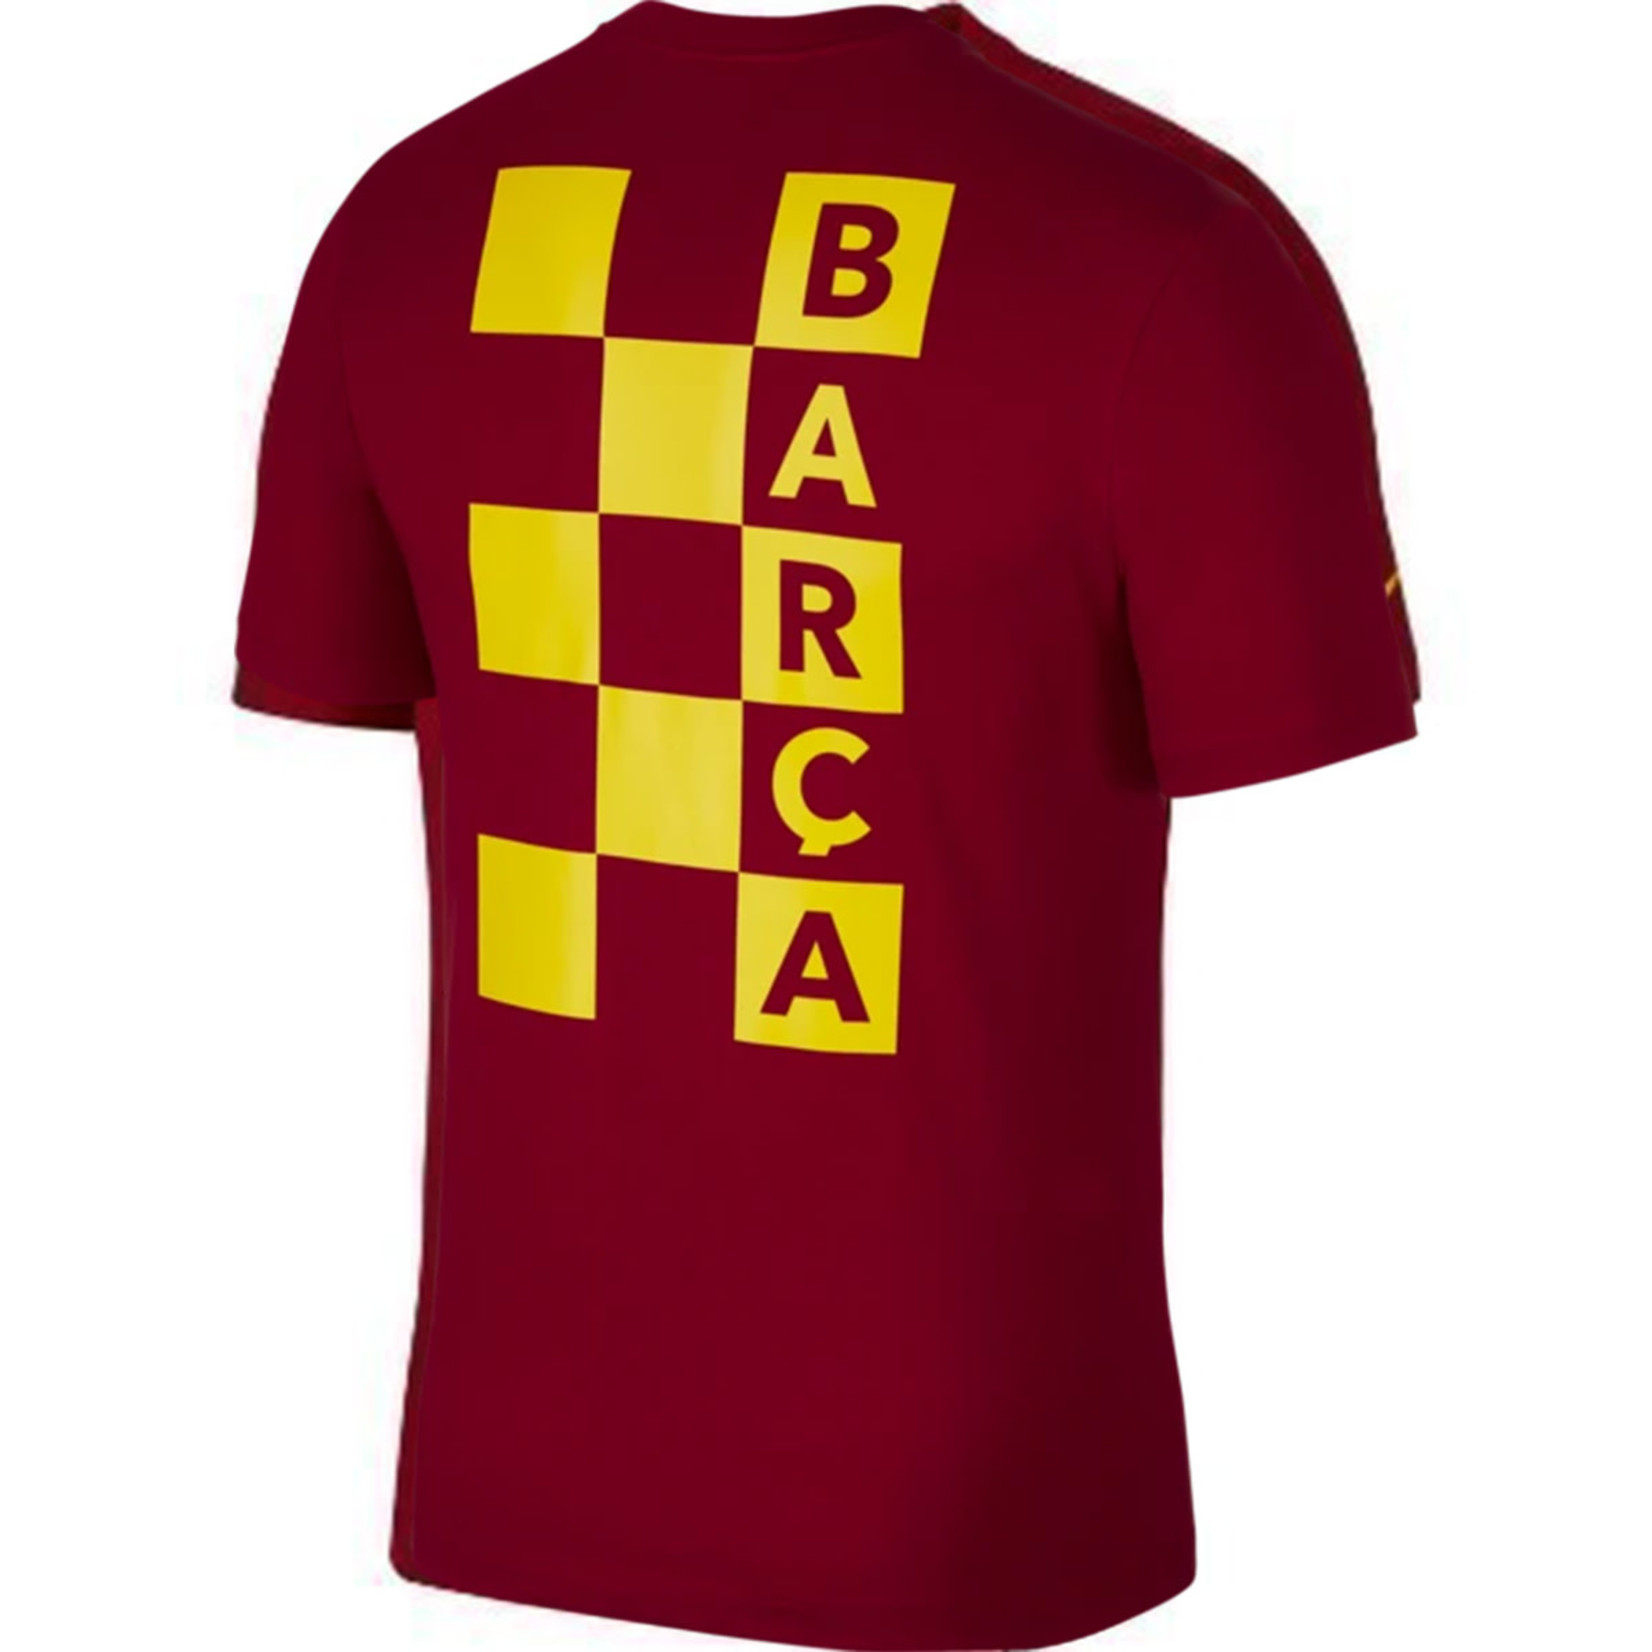 NIKE FC BARCELONA 19/20 KIT STORY TEE